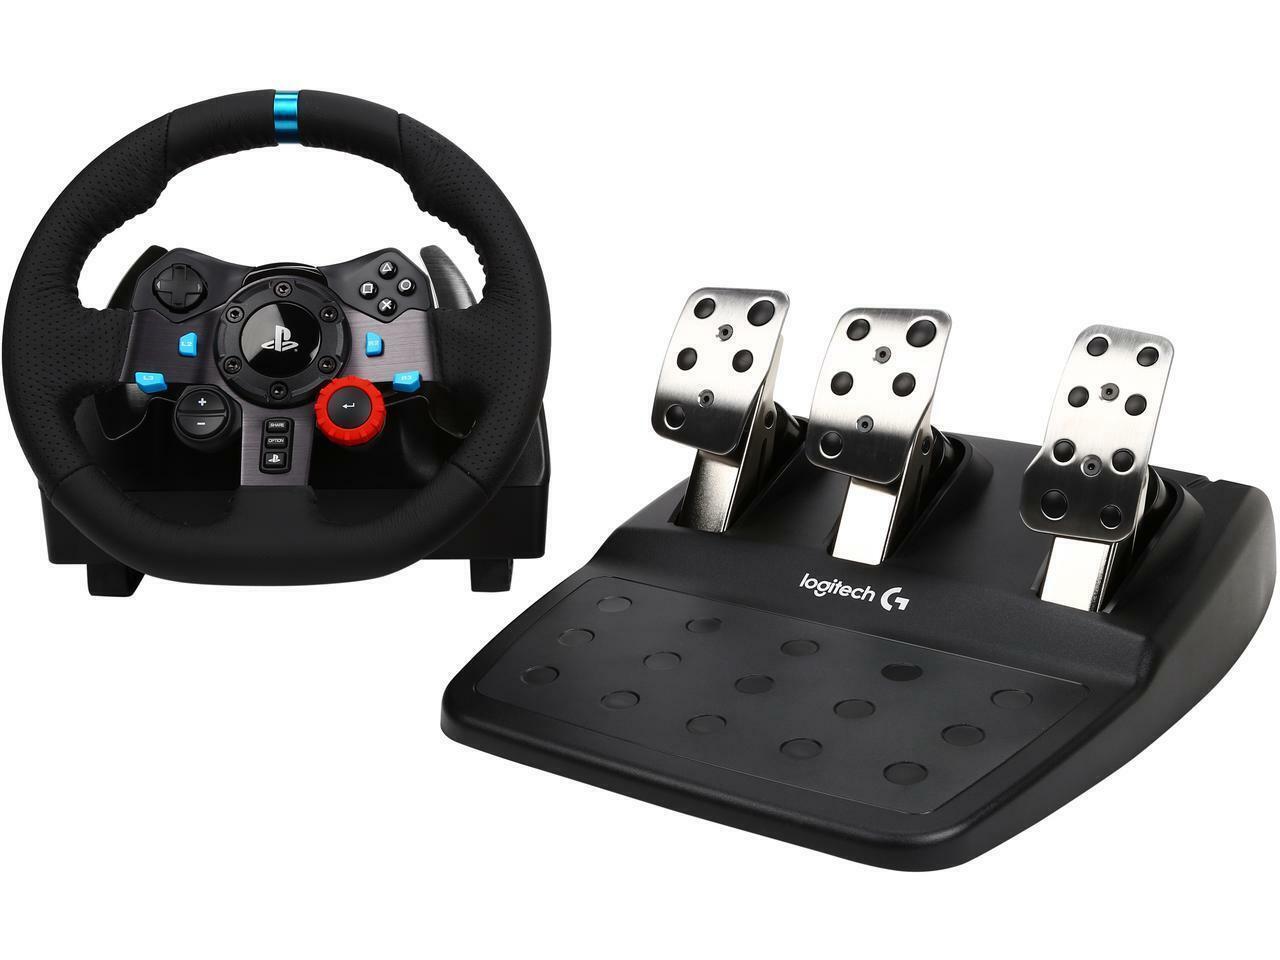 a6a998e8889 Logitech Driving Force G29 Racing Wheel (941-000110) for sale online ...